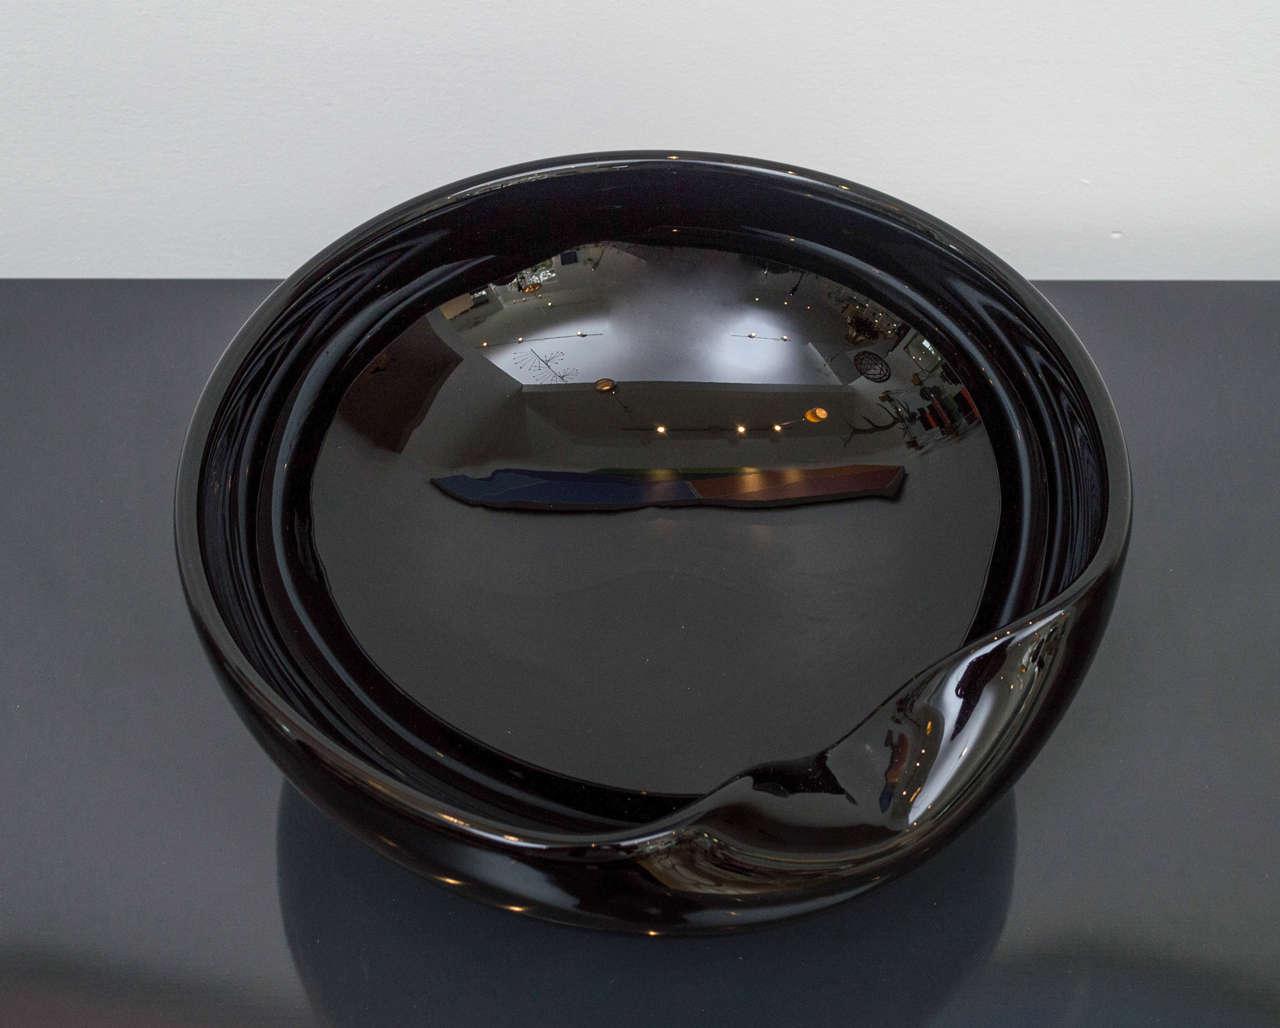 Large Elsa Peretti Thumbprint Bowl For Tiffany And Co At